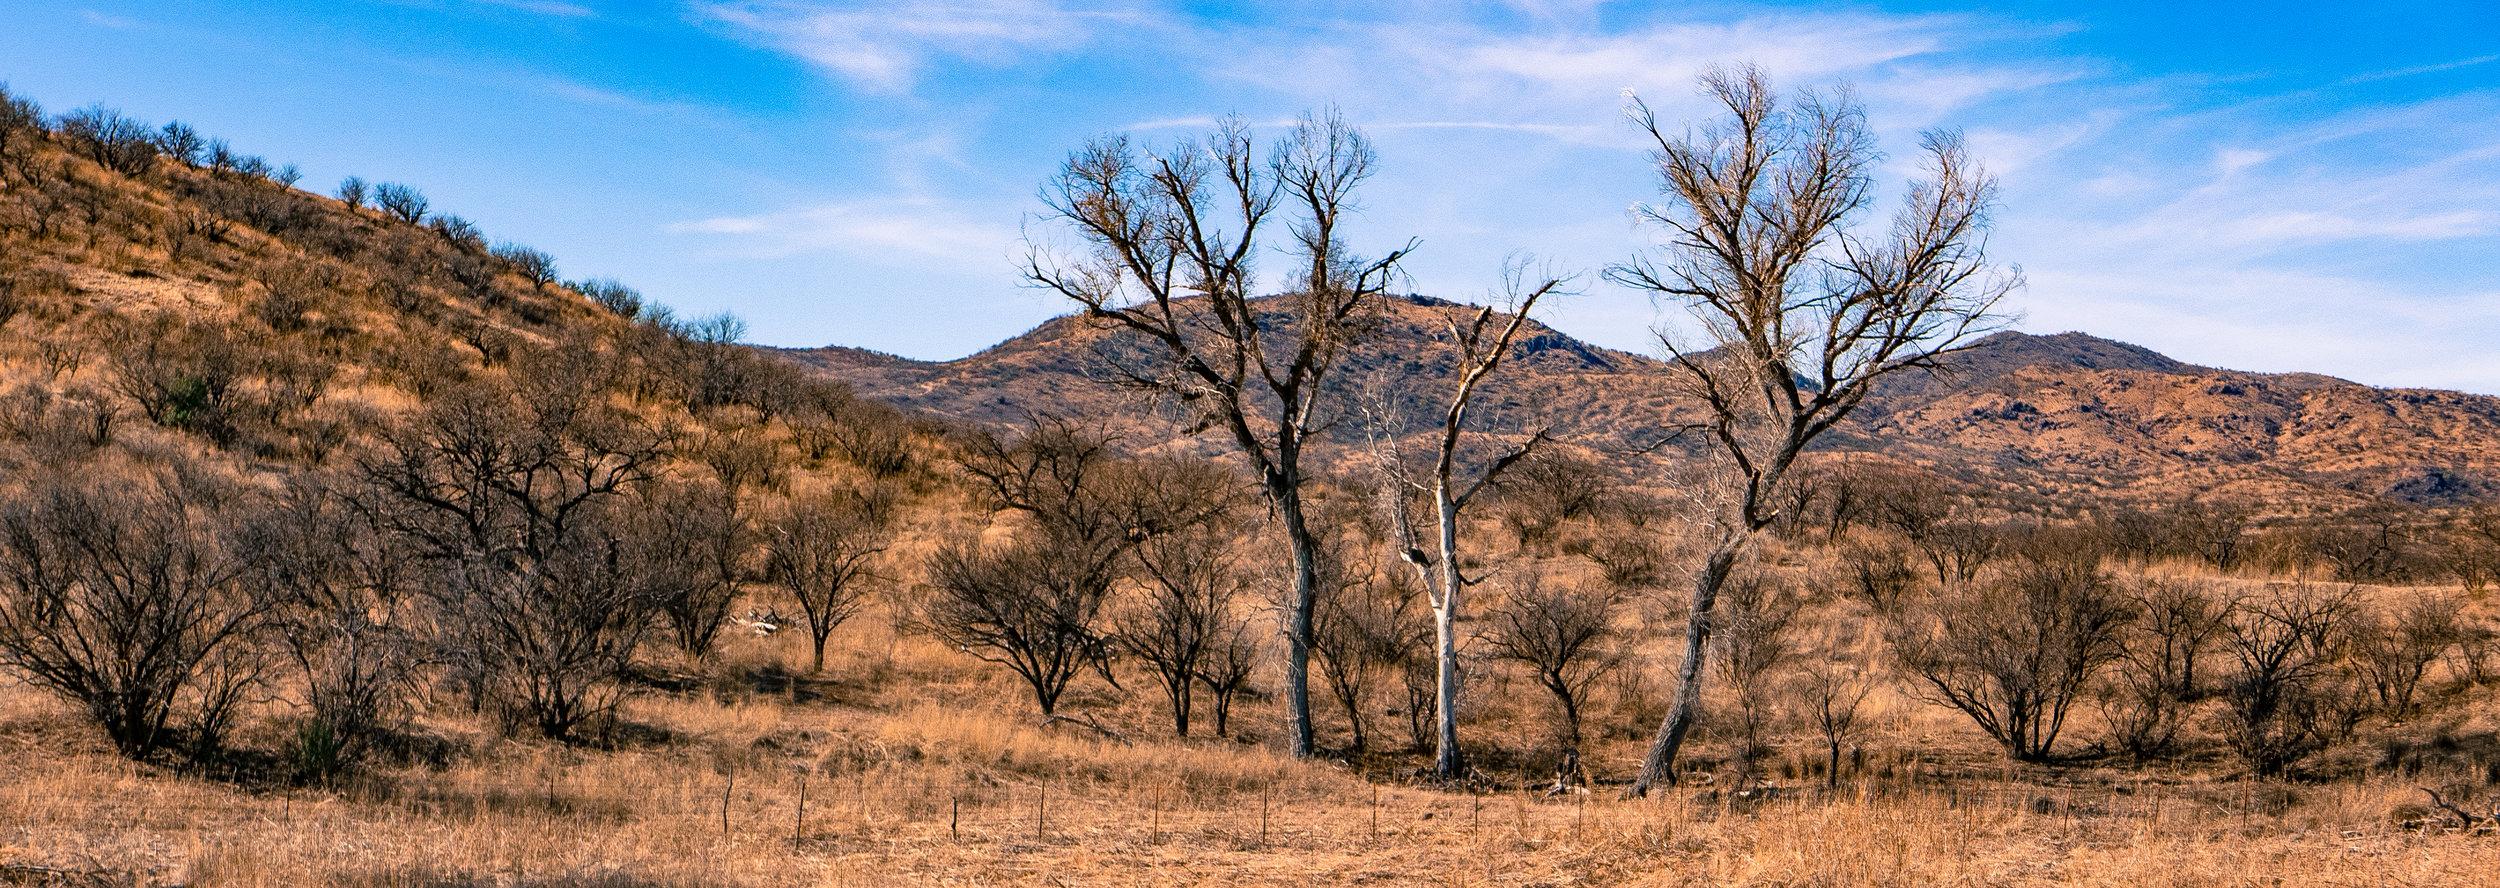 Winter grasslands make a wide open landscape in Arizona.